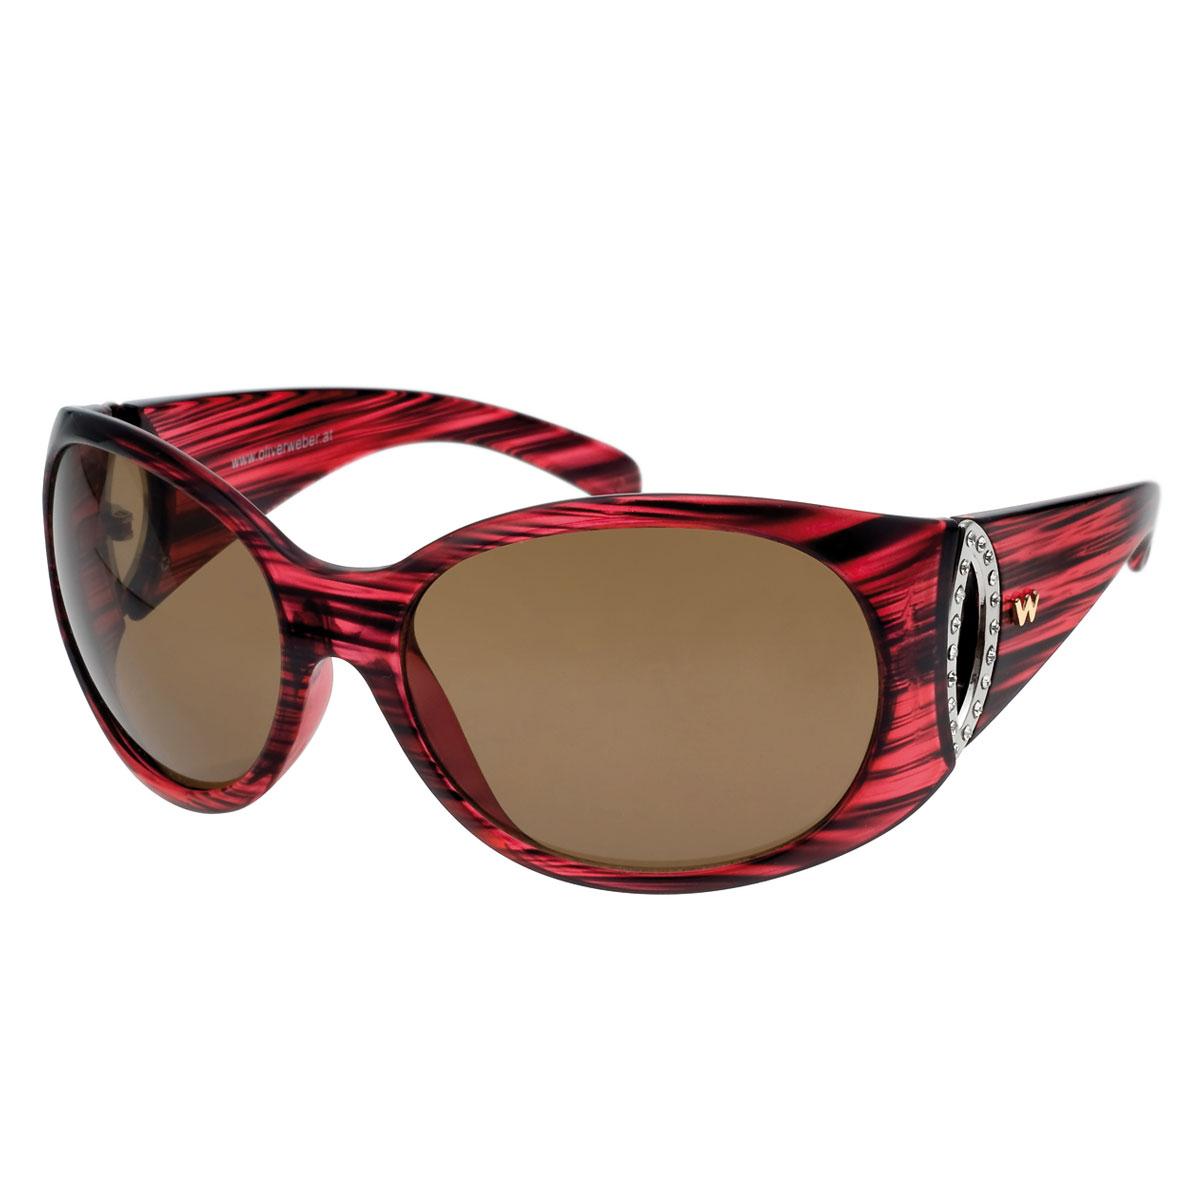 عینک آفتابی مدل ویرجینیا قرمز